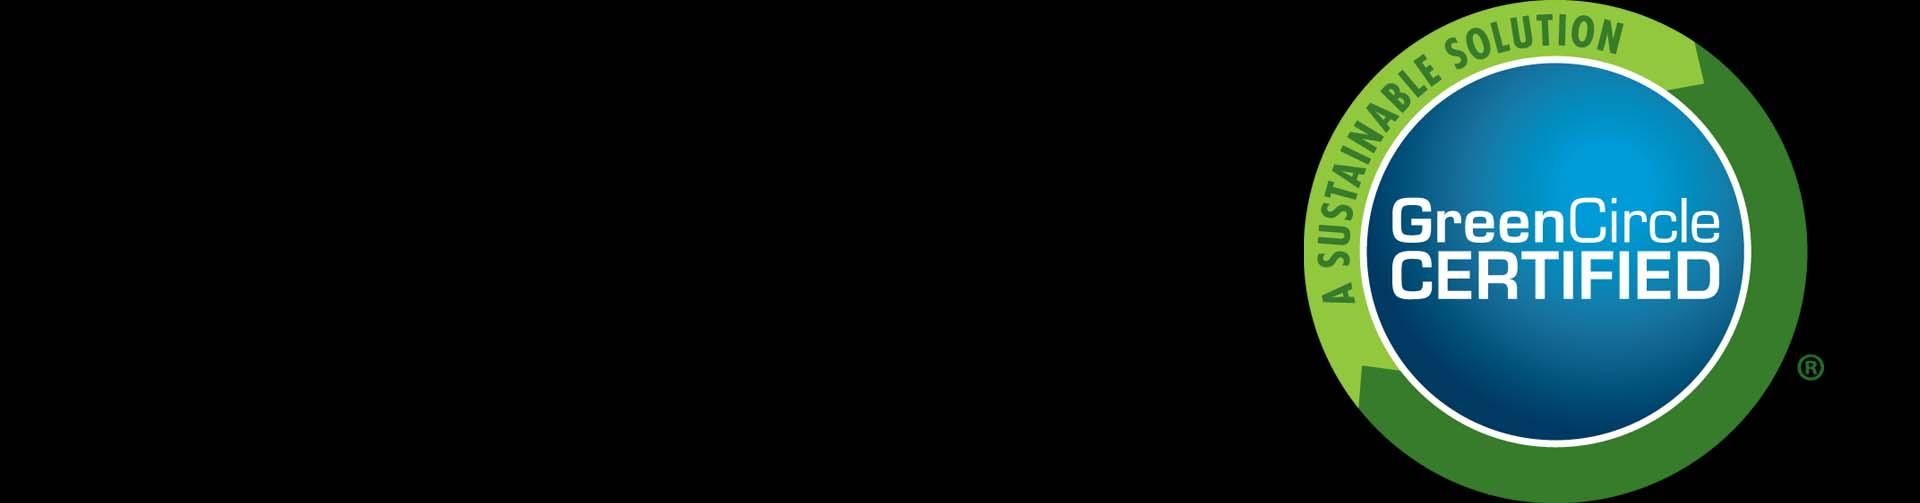 GreenCircle Homepage banner